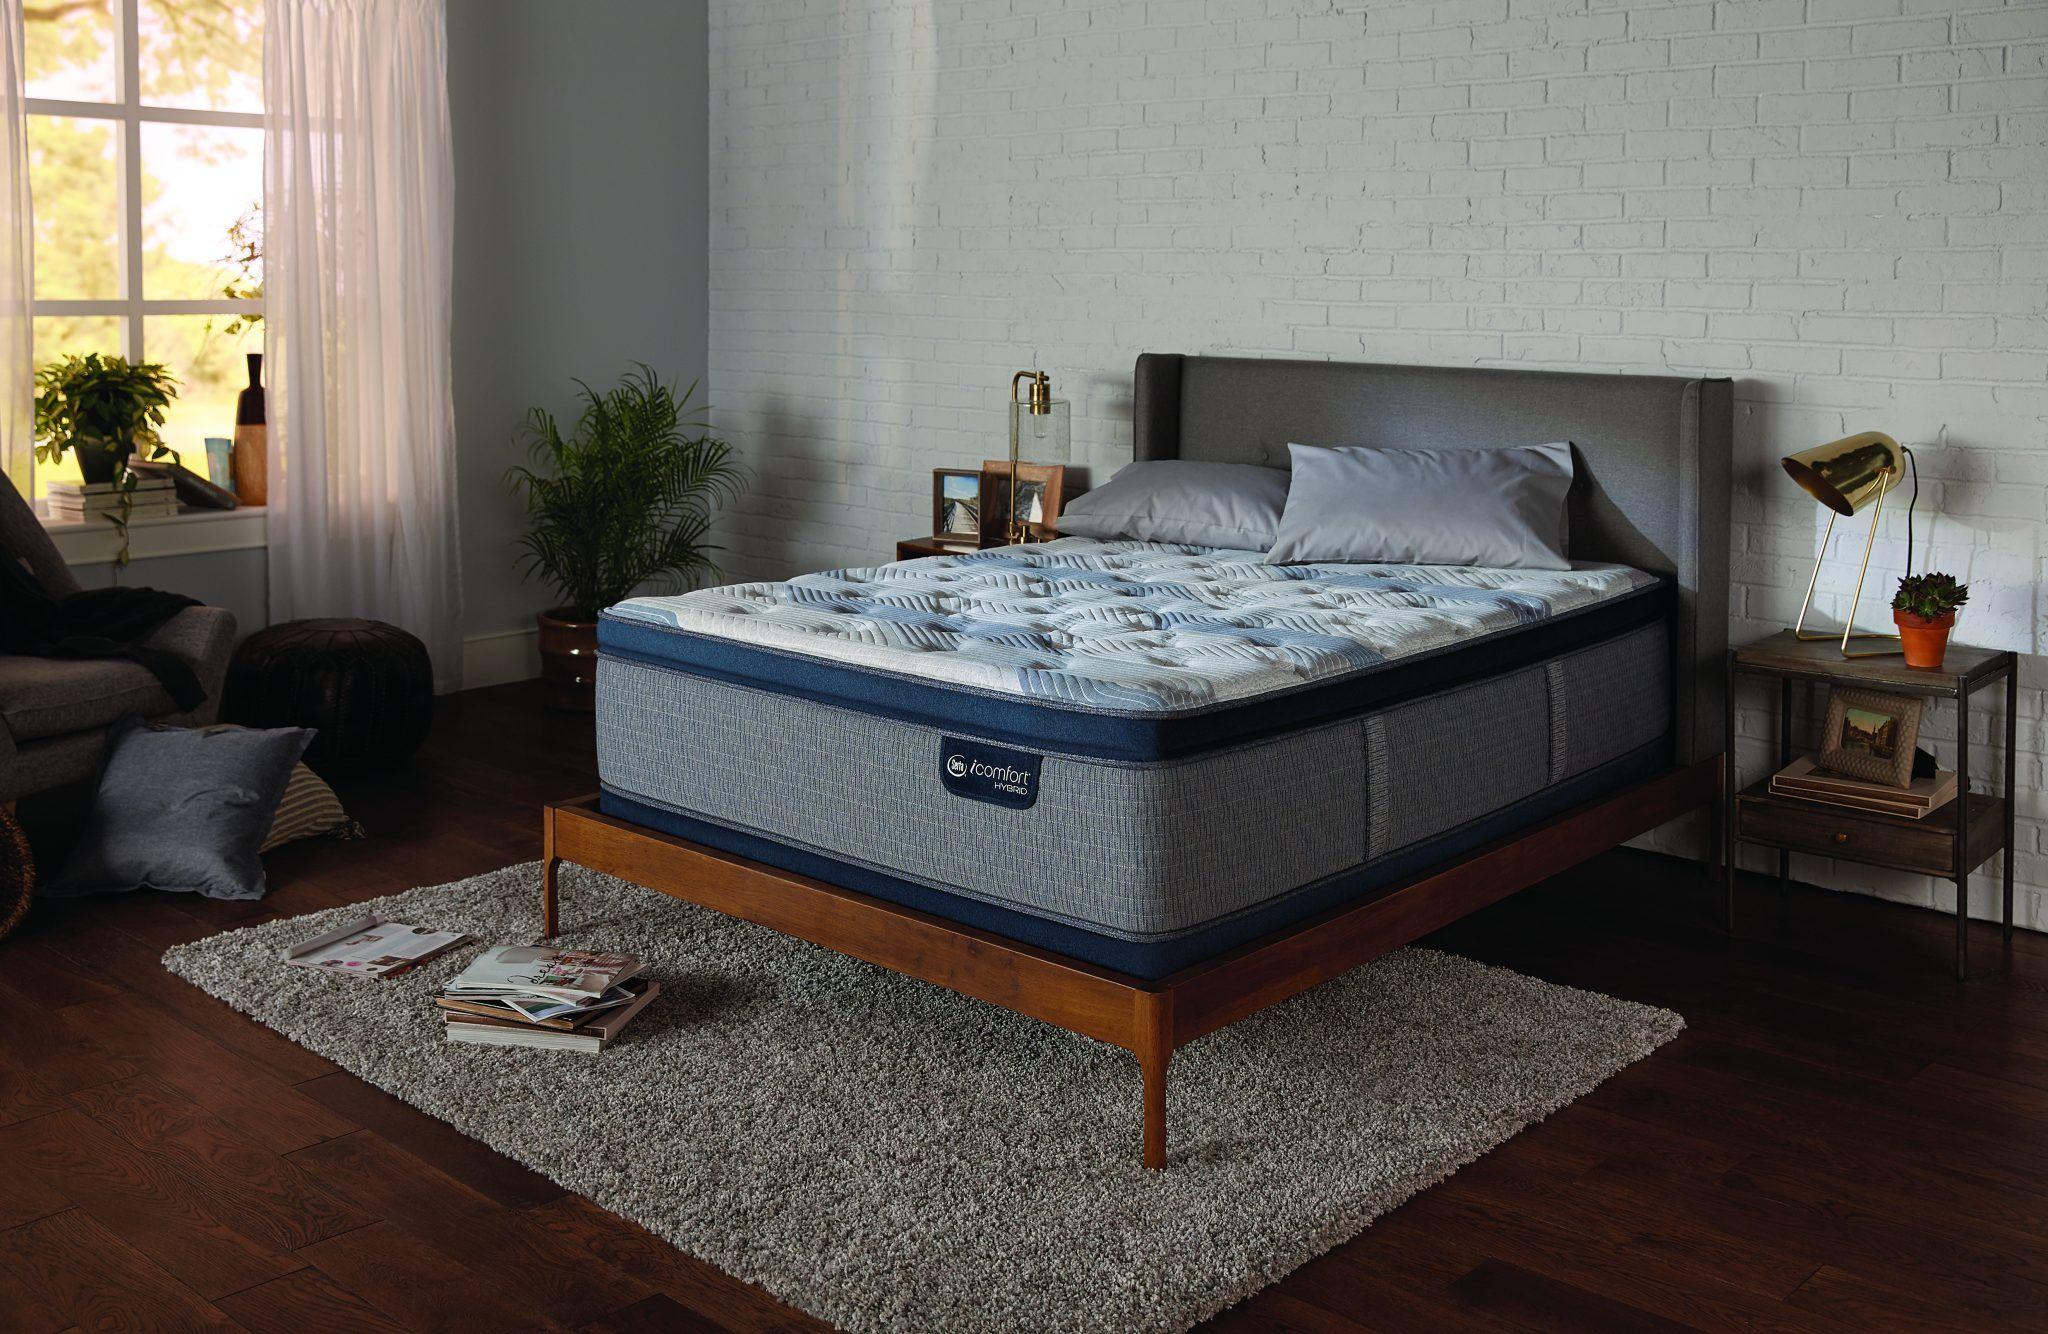 Icomfort Hybrid Best Mattress Plush Pillows Serta Mattress Twin Xl Mattress